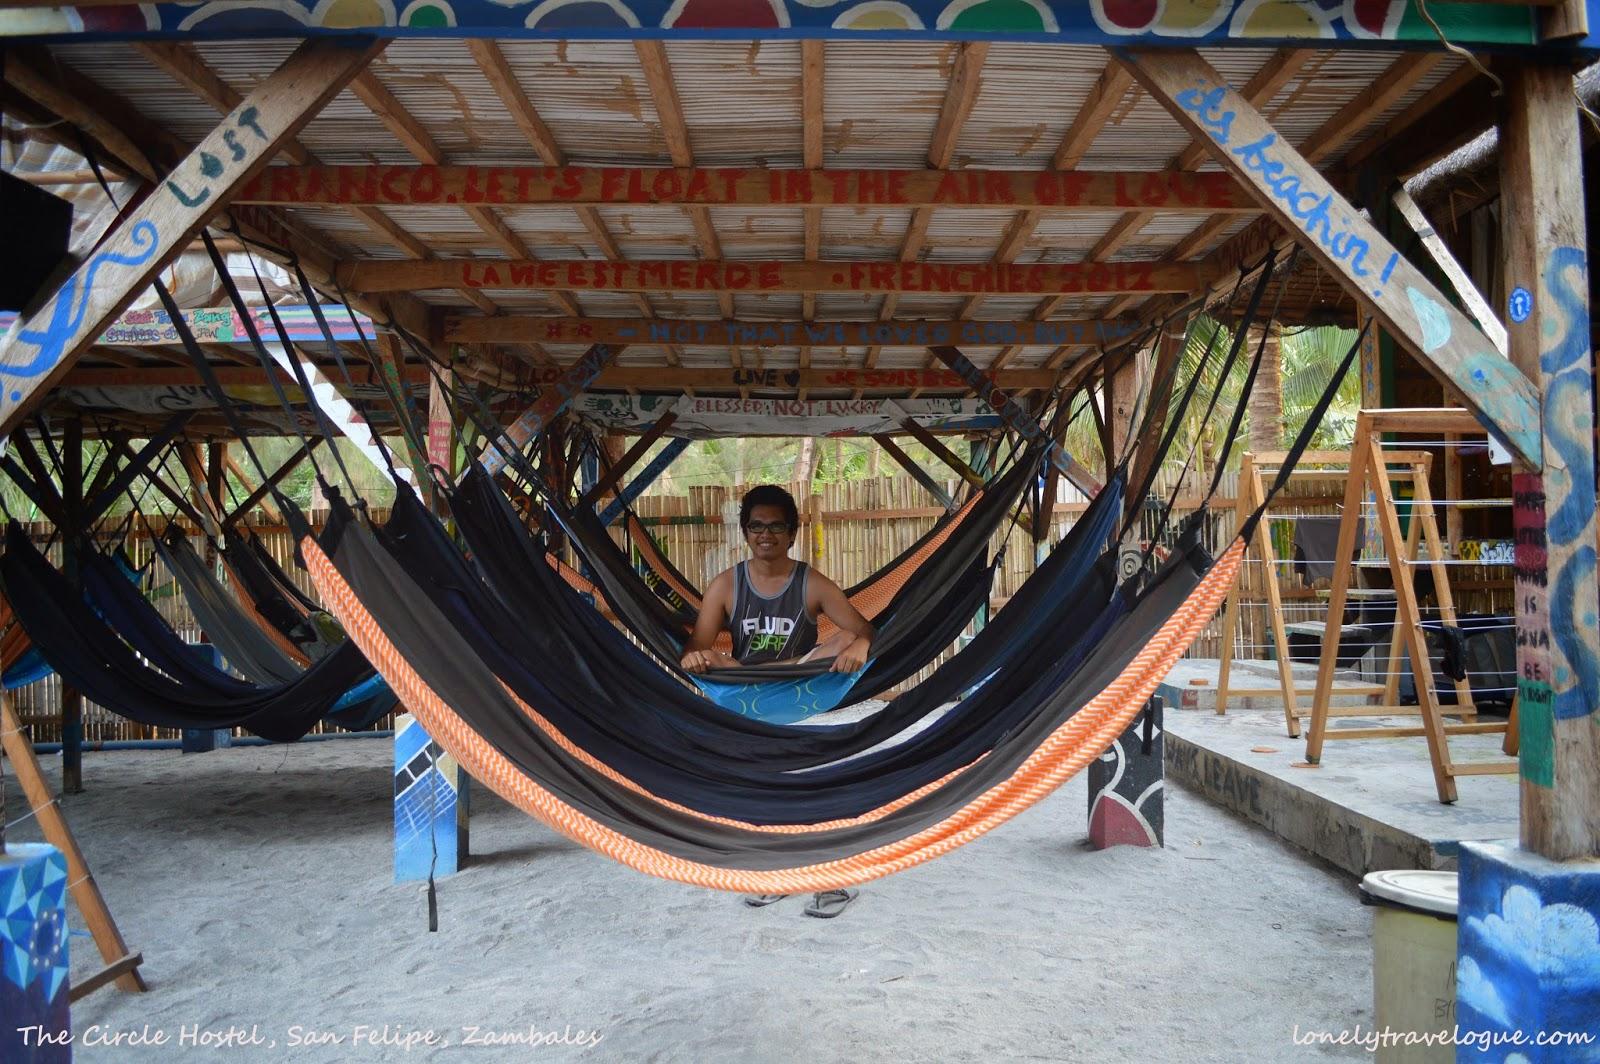 sa hammock tepok ang lamok  lonely travelogue  where to stay in liw liwa san felipe zambales      rh   lonelytravelogue